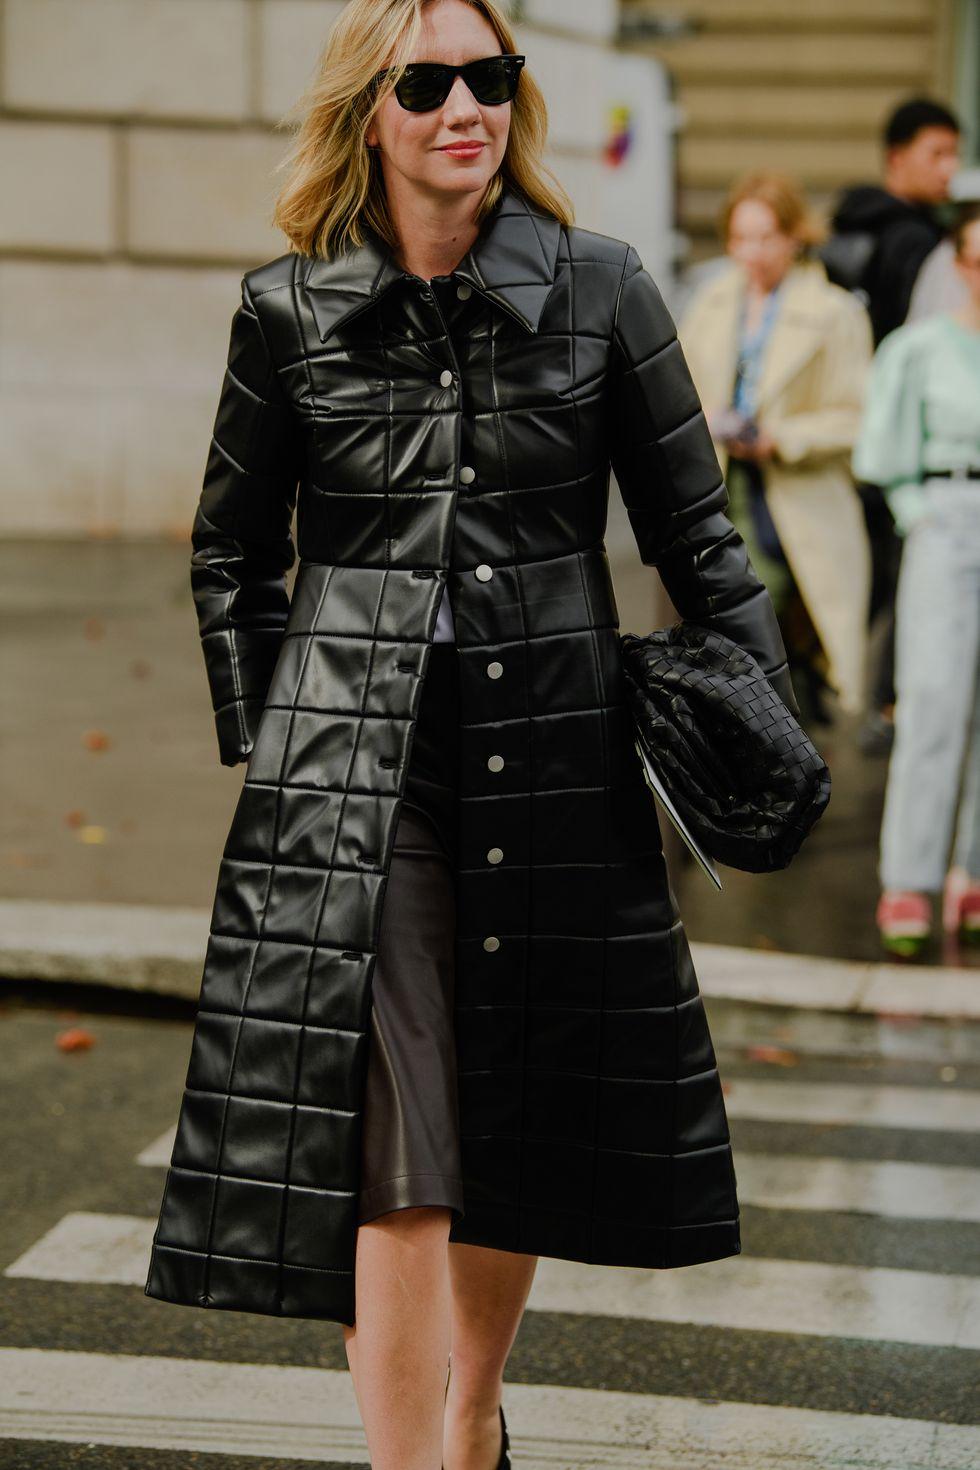 paris-fashion-week-pfw-street-style-ss20-day-7-by-tyler-joe-179-1570134365